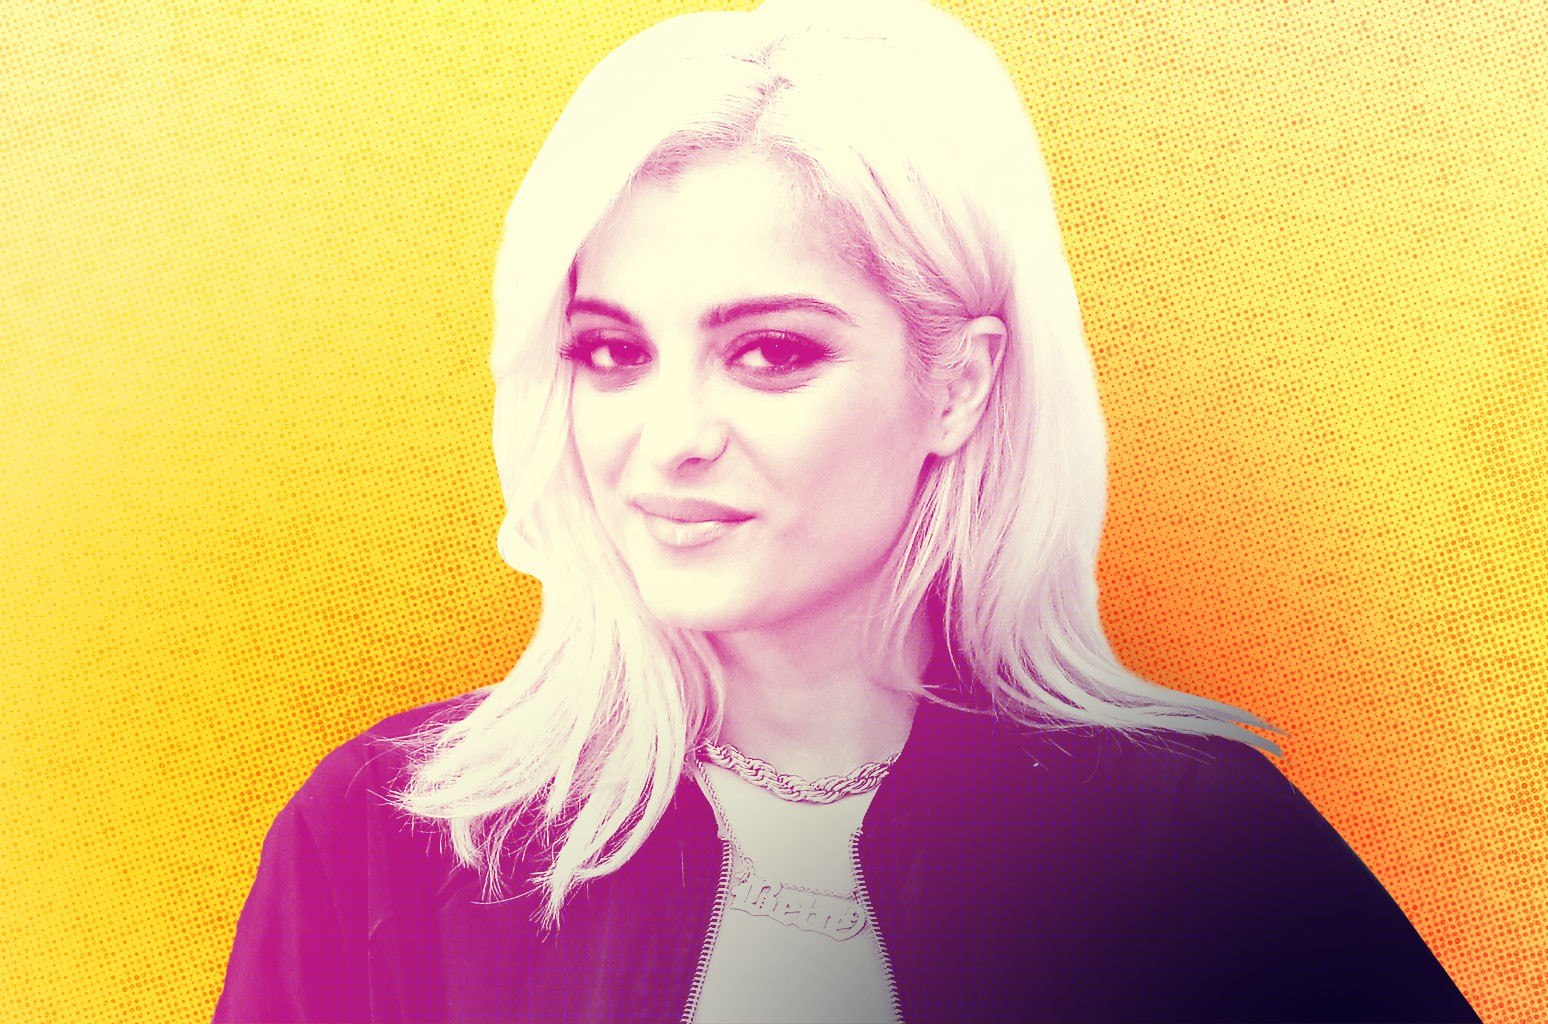 Bebe Rexha 7 Songs You Didn T Know She Wrote Billboard Billboard